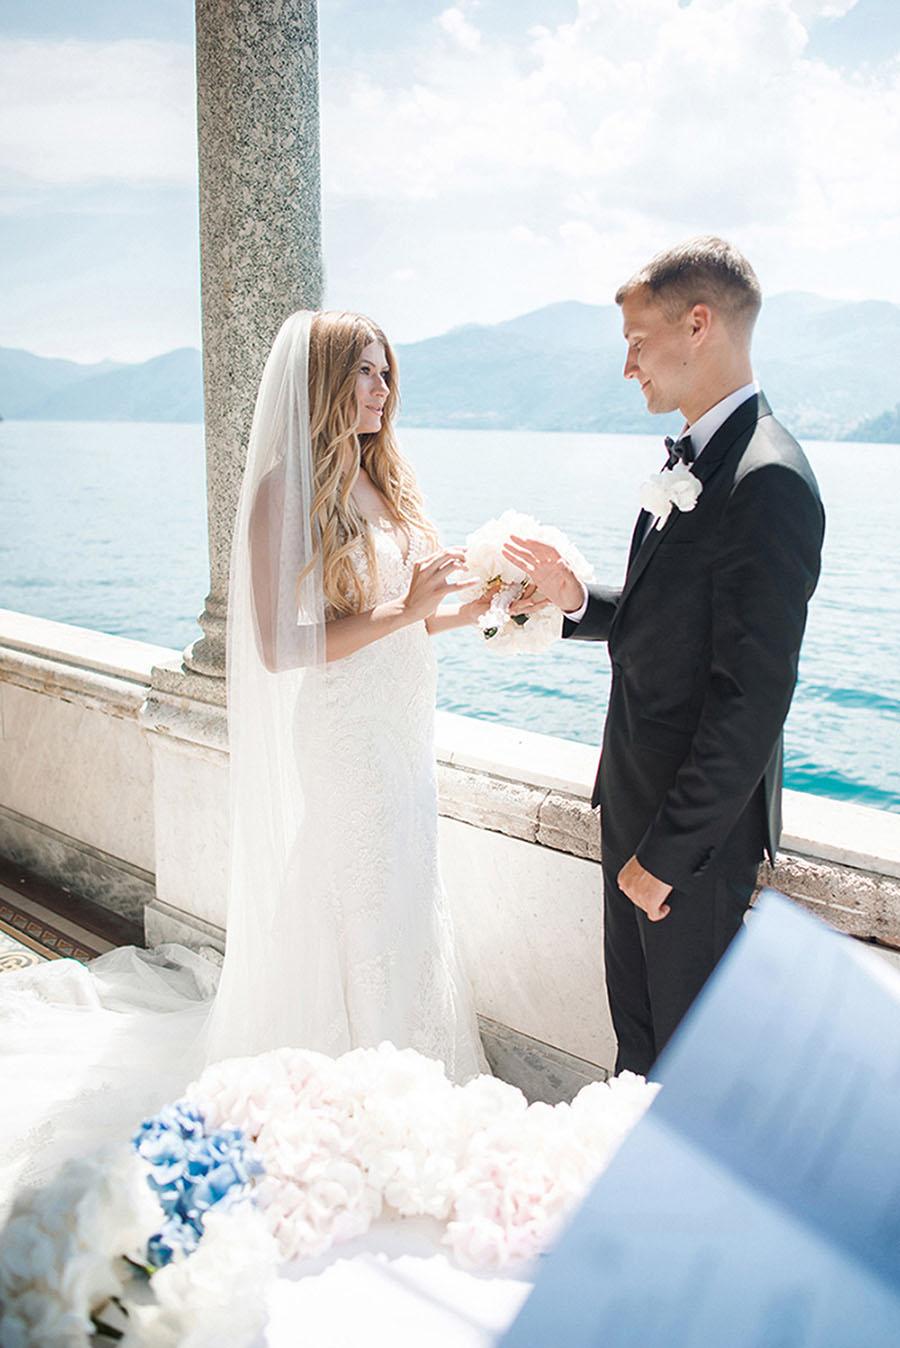 Wedding on lake Como. Wedding in Italy